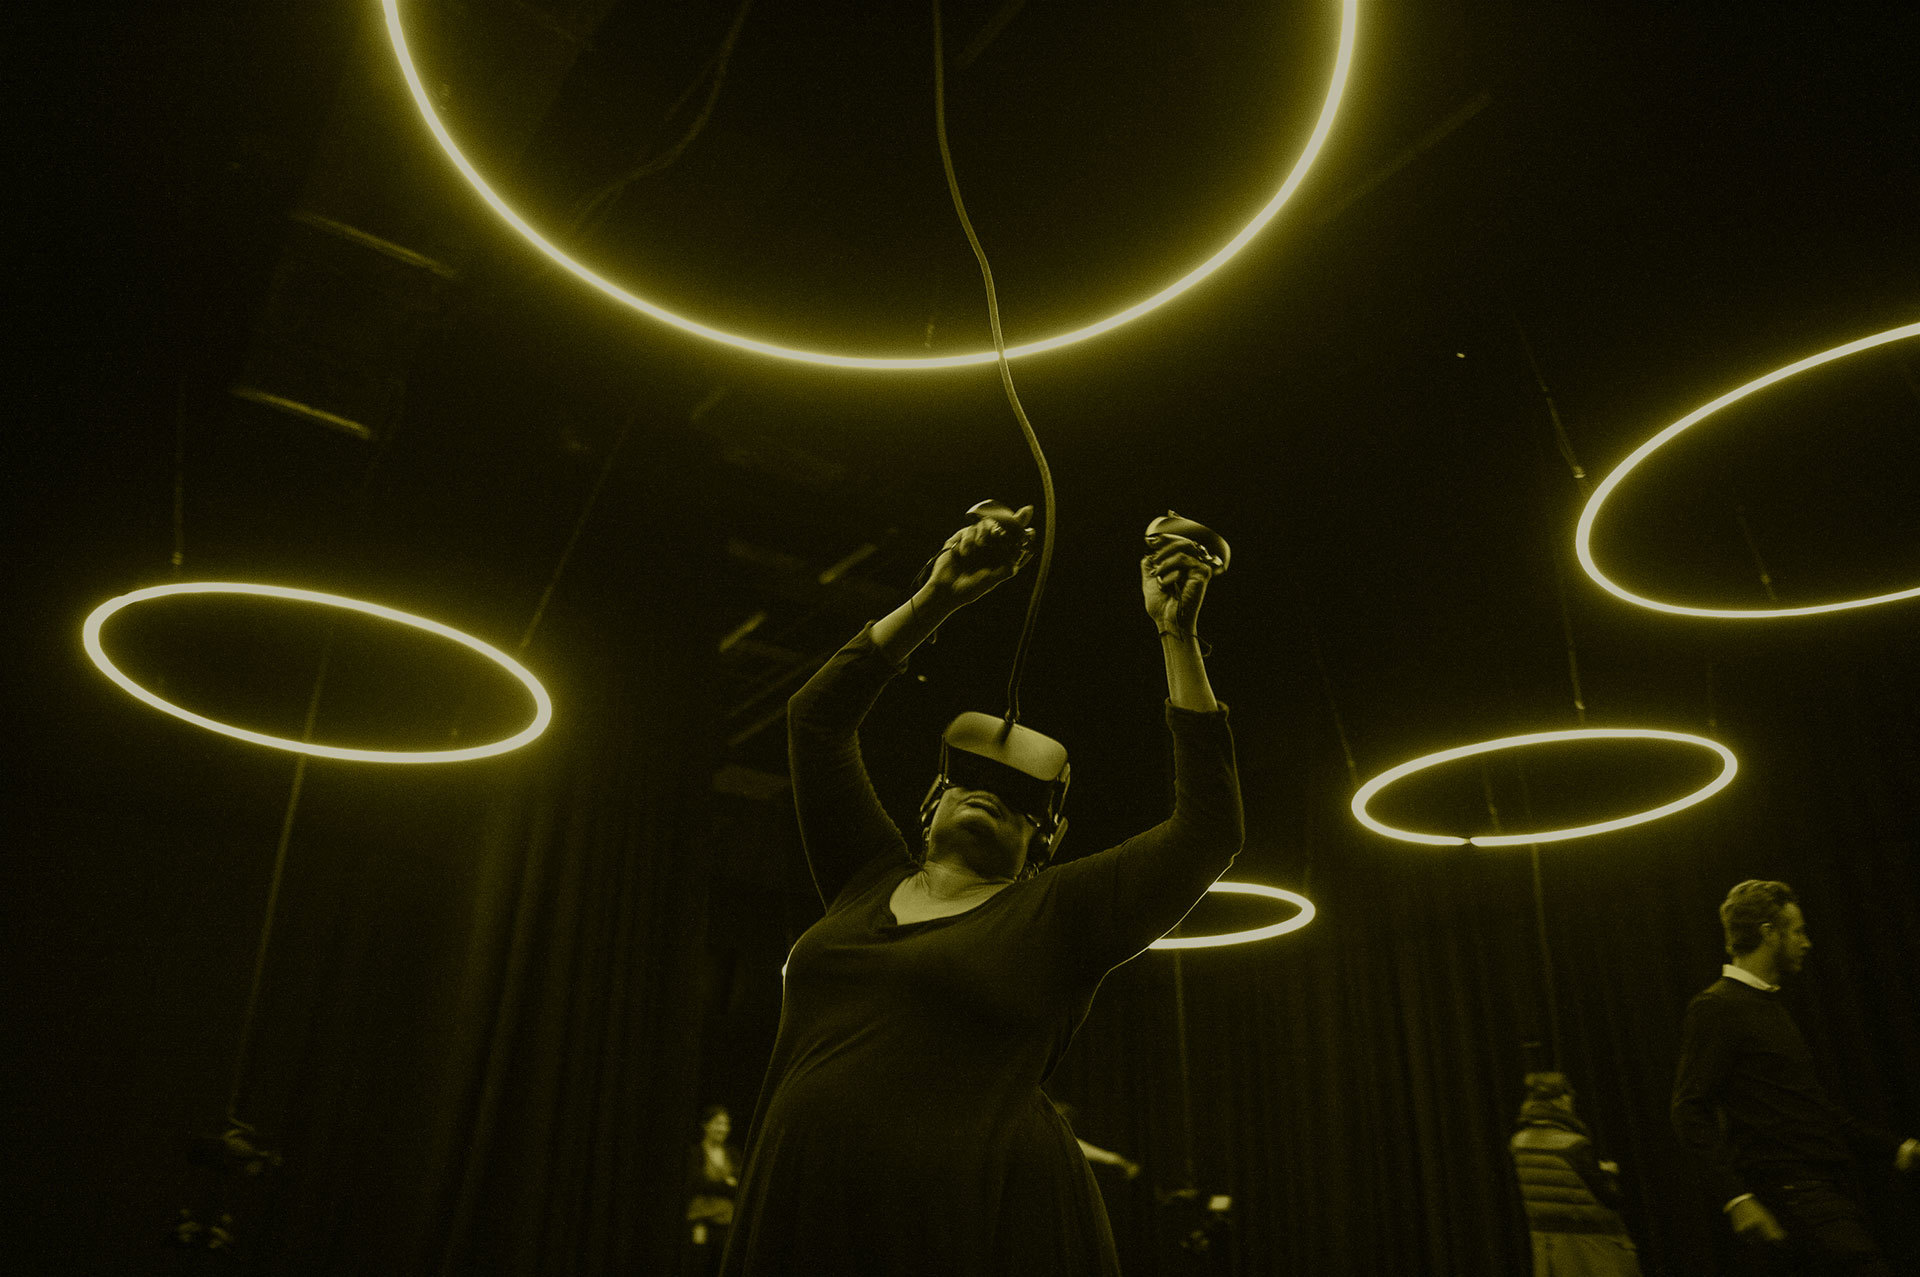 Installation Spheres, Rockefeller Center, Crédit: Kat Harris